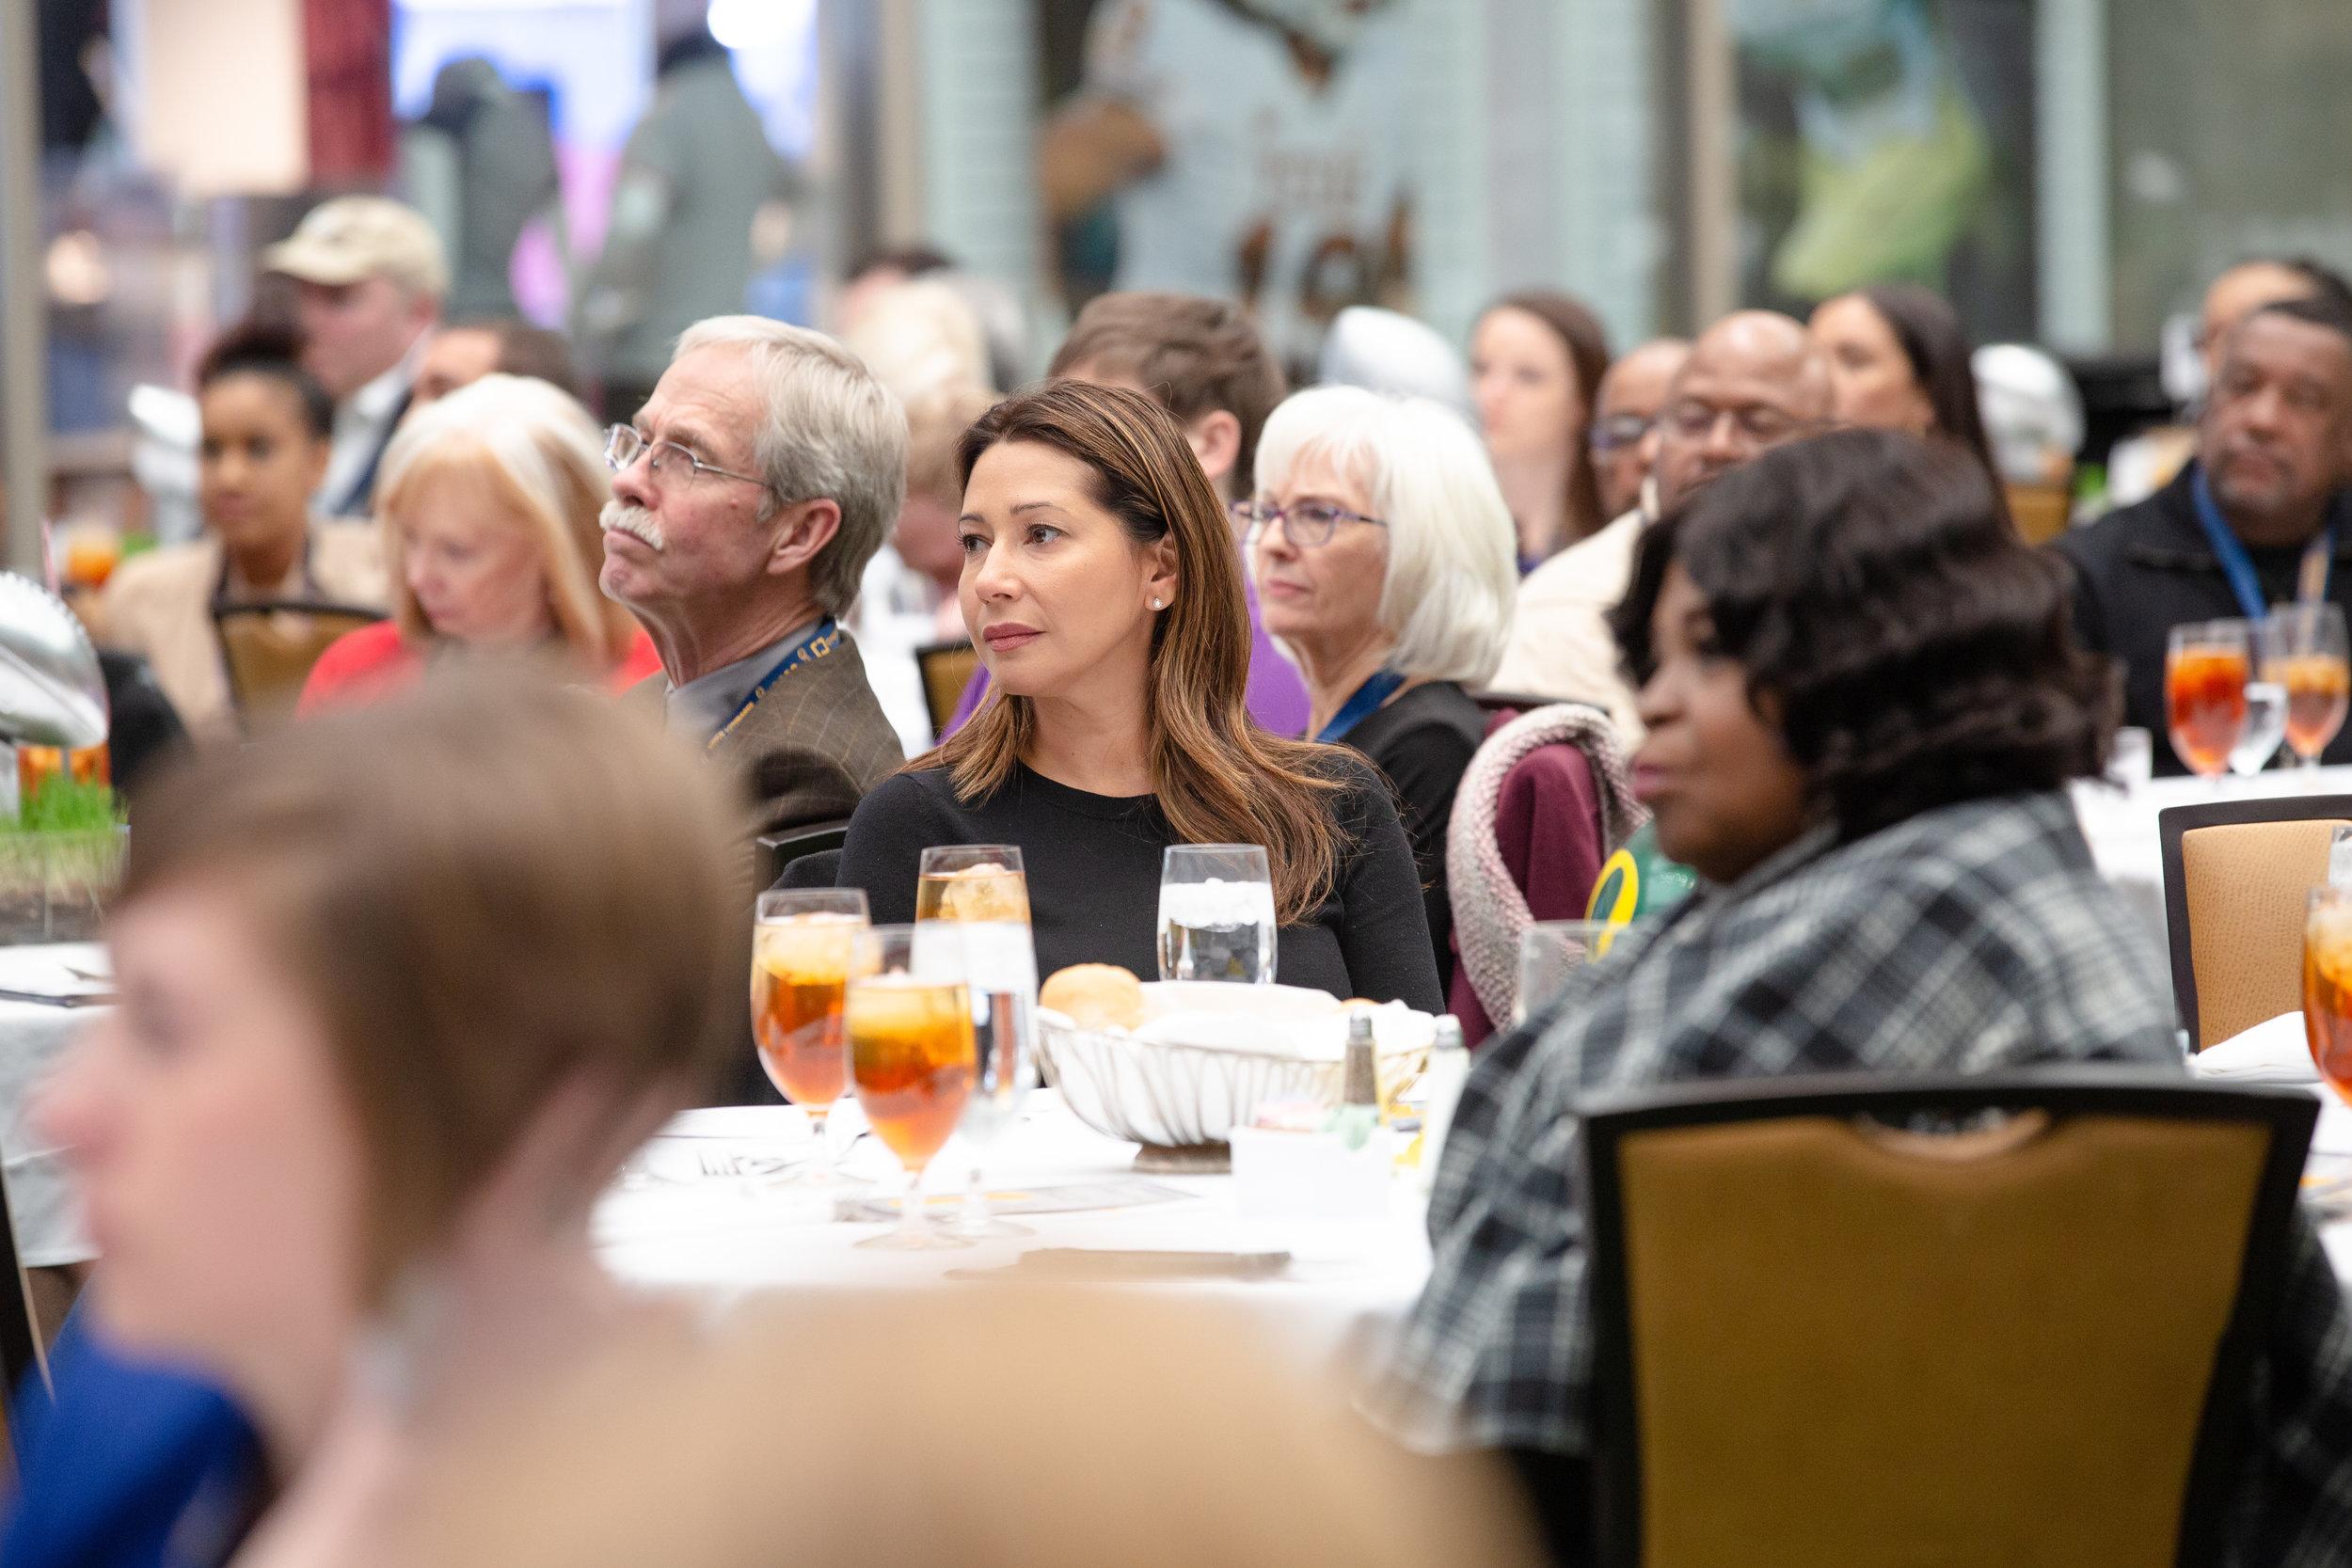 Vince Lombardi Cancer Foundation Event -20190131-0832.jpg